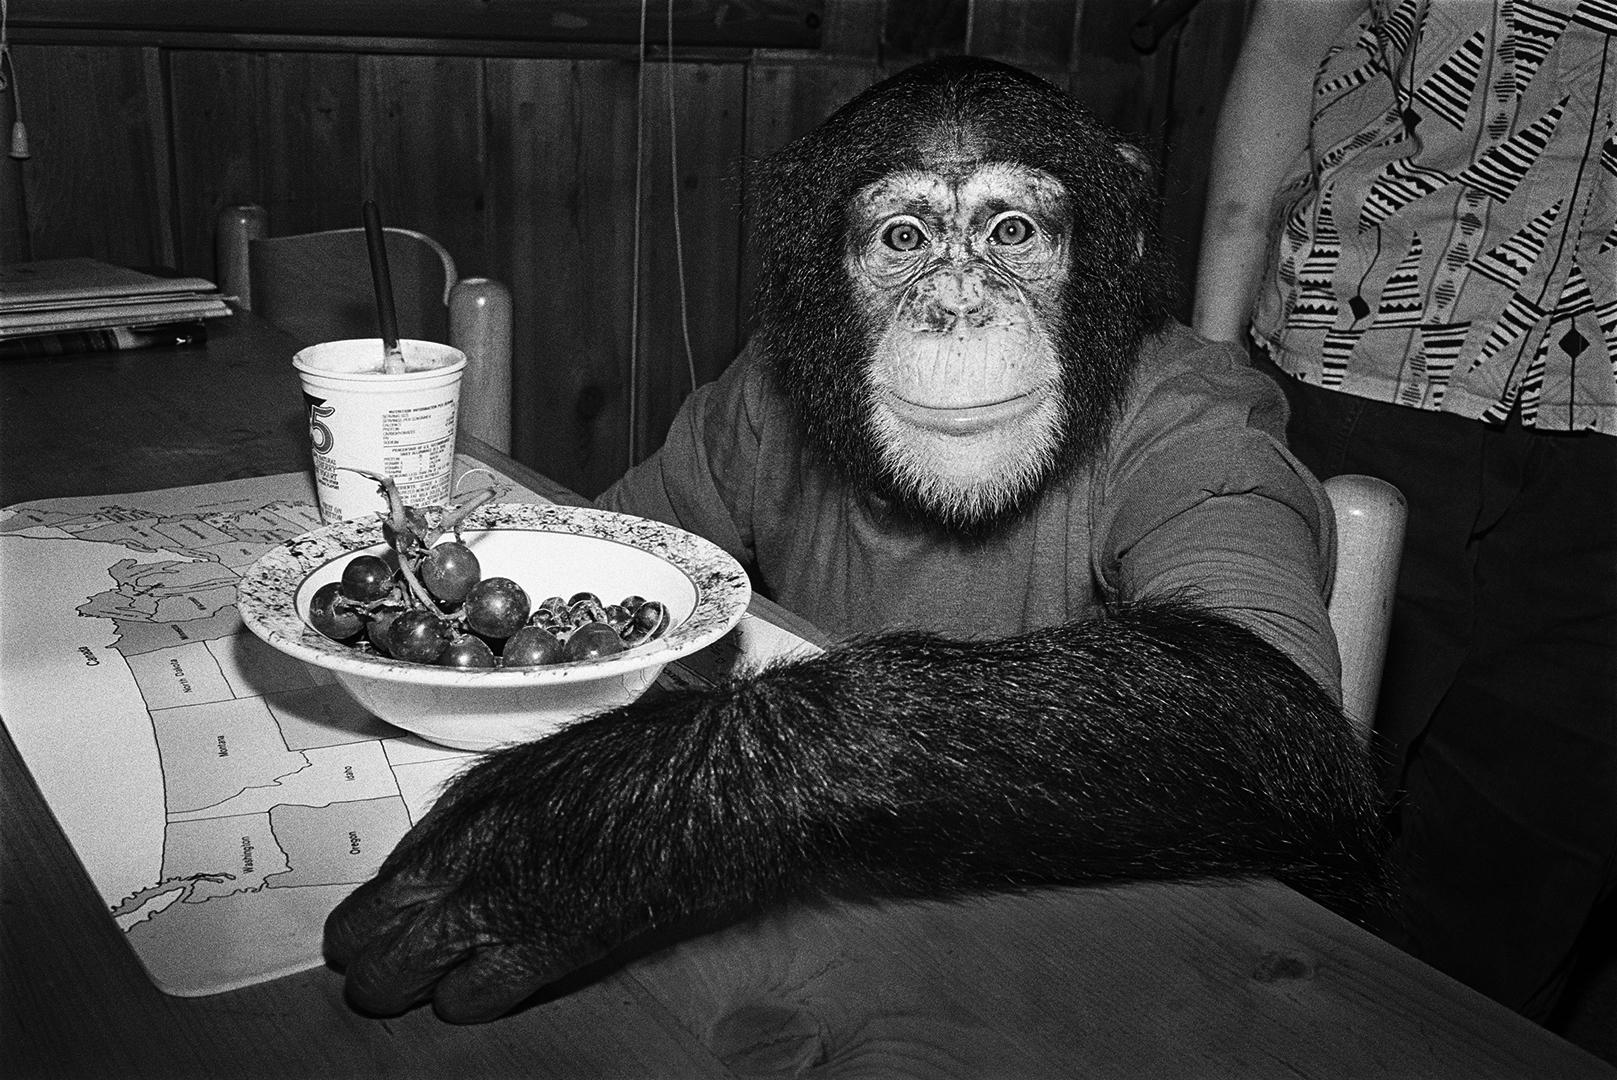 Charlie, 1988. Chimpanzee, female, 5 years old.